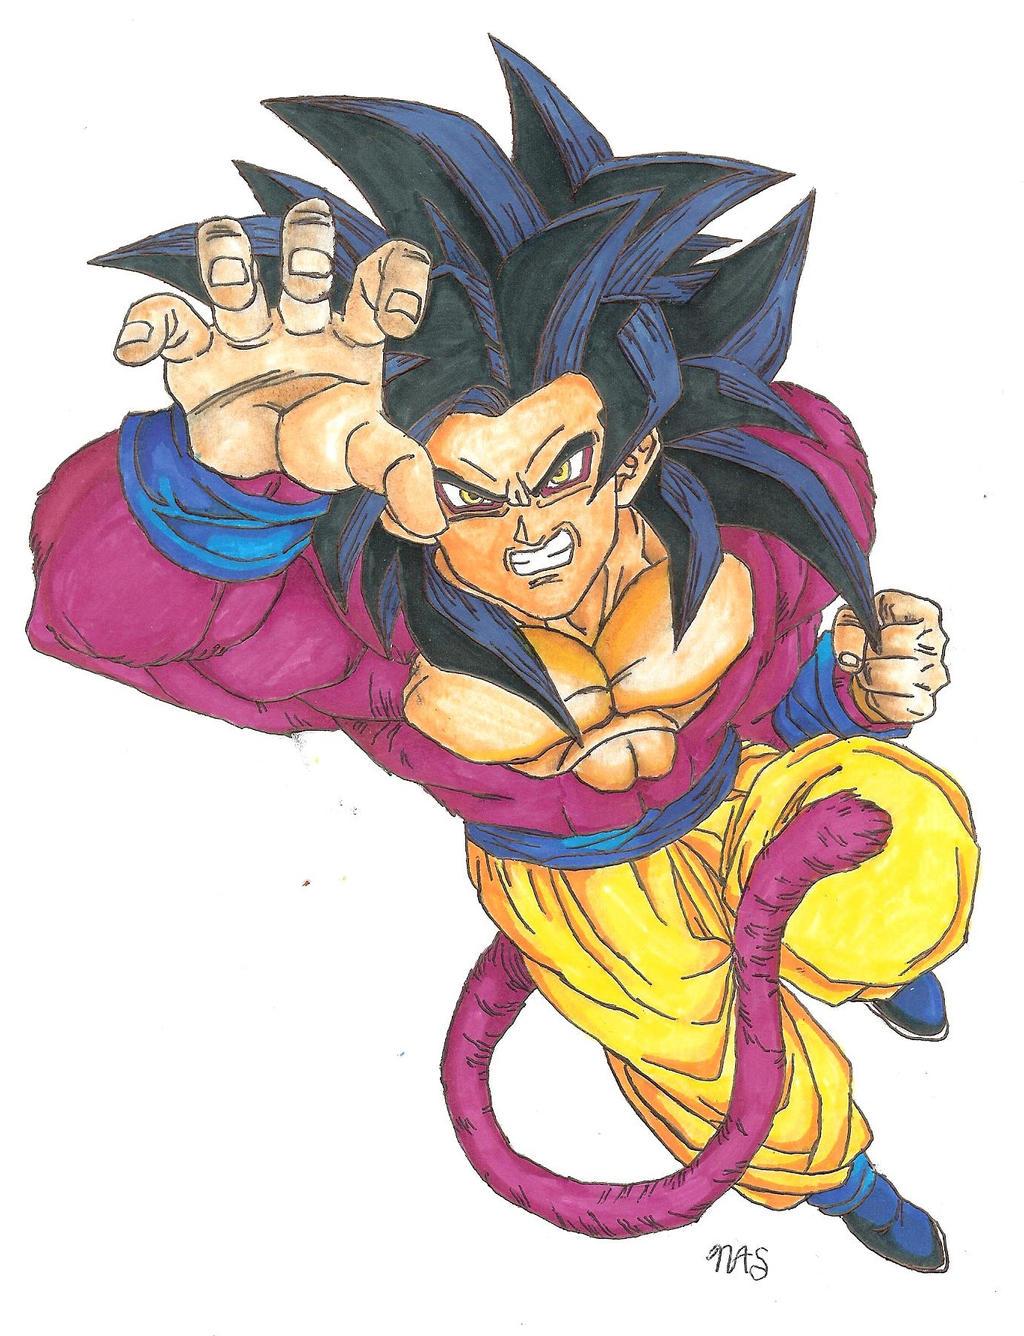 Goku Super Saiyan 4 by GokuIsTheBomb Goku Super Saiyan 4 by GokuIsTheBomb